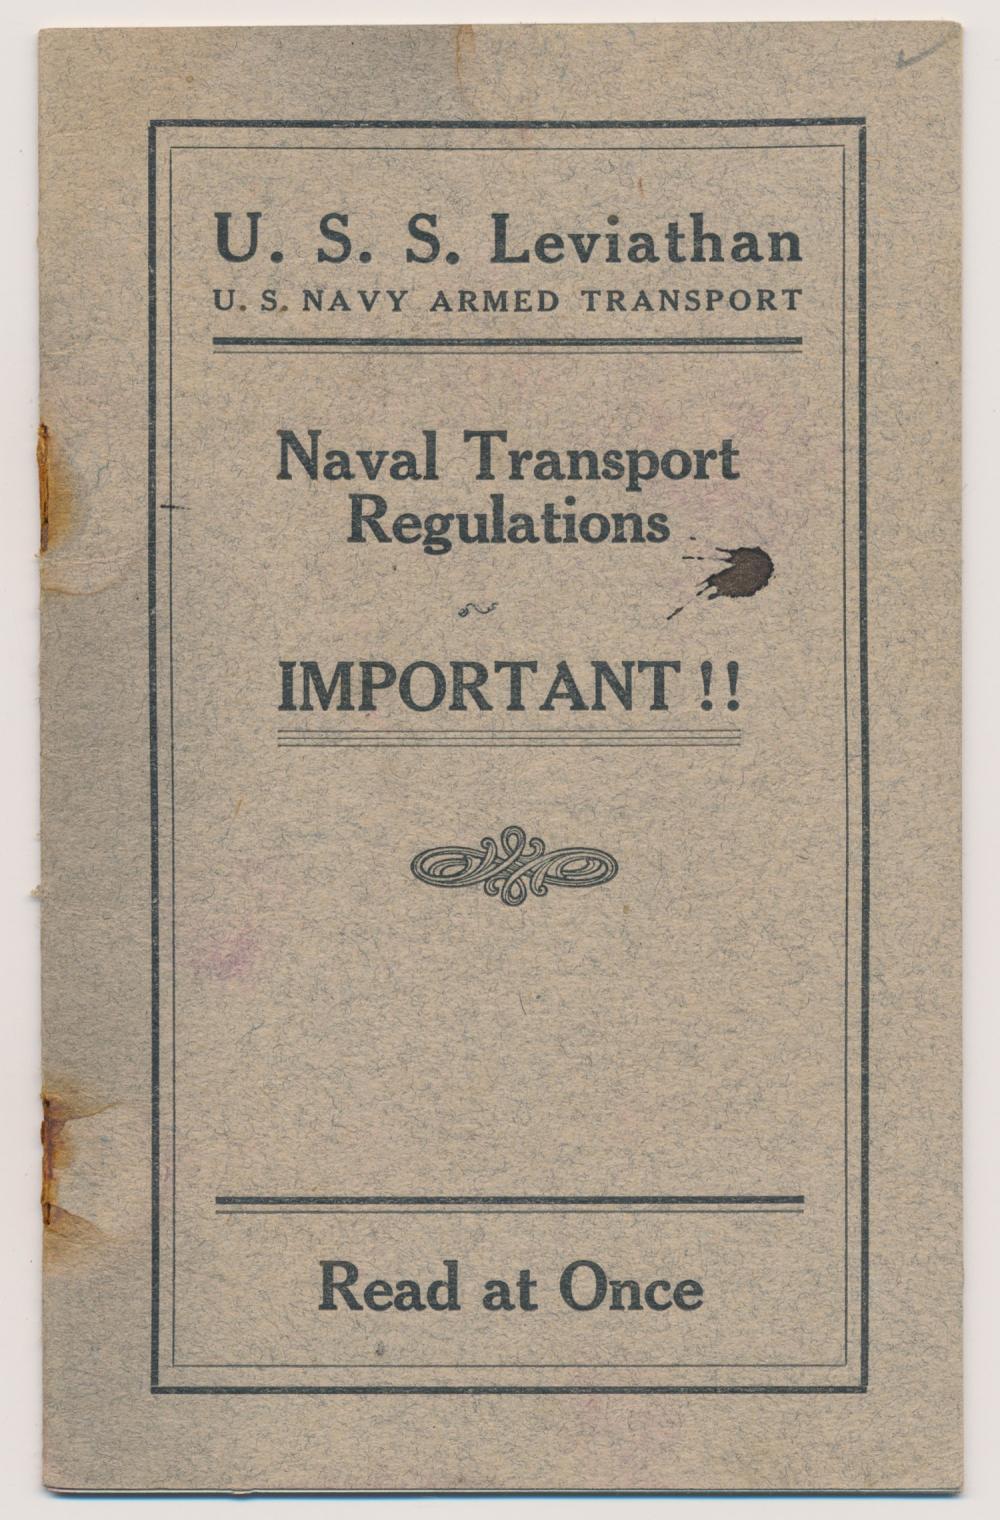 USS LEVIATHAN TRANSPORT REGULATIONS